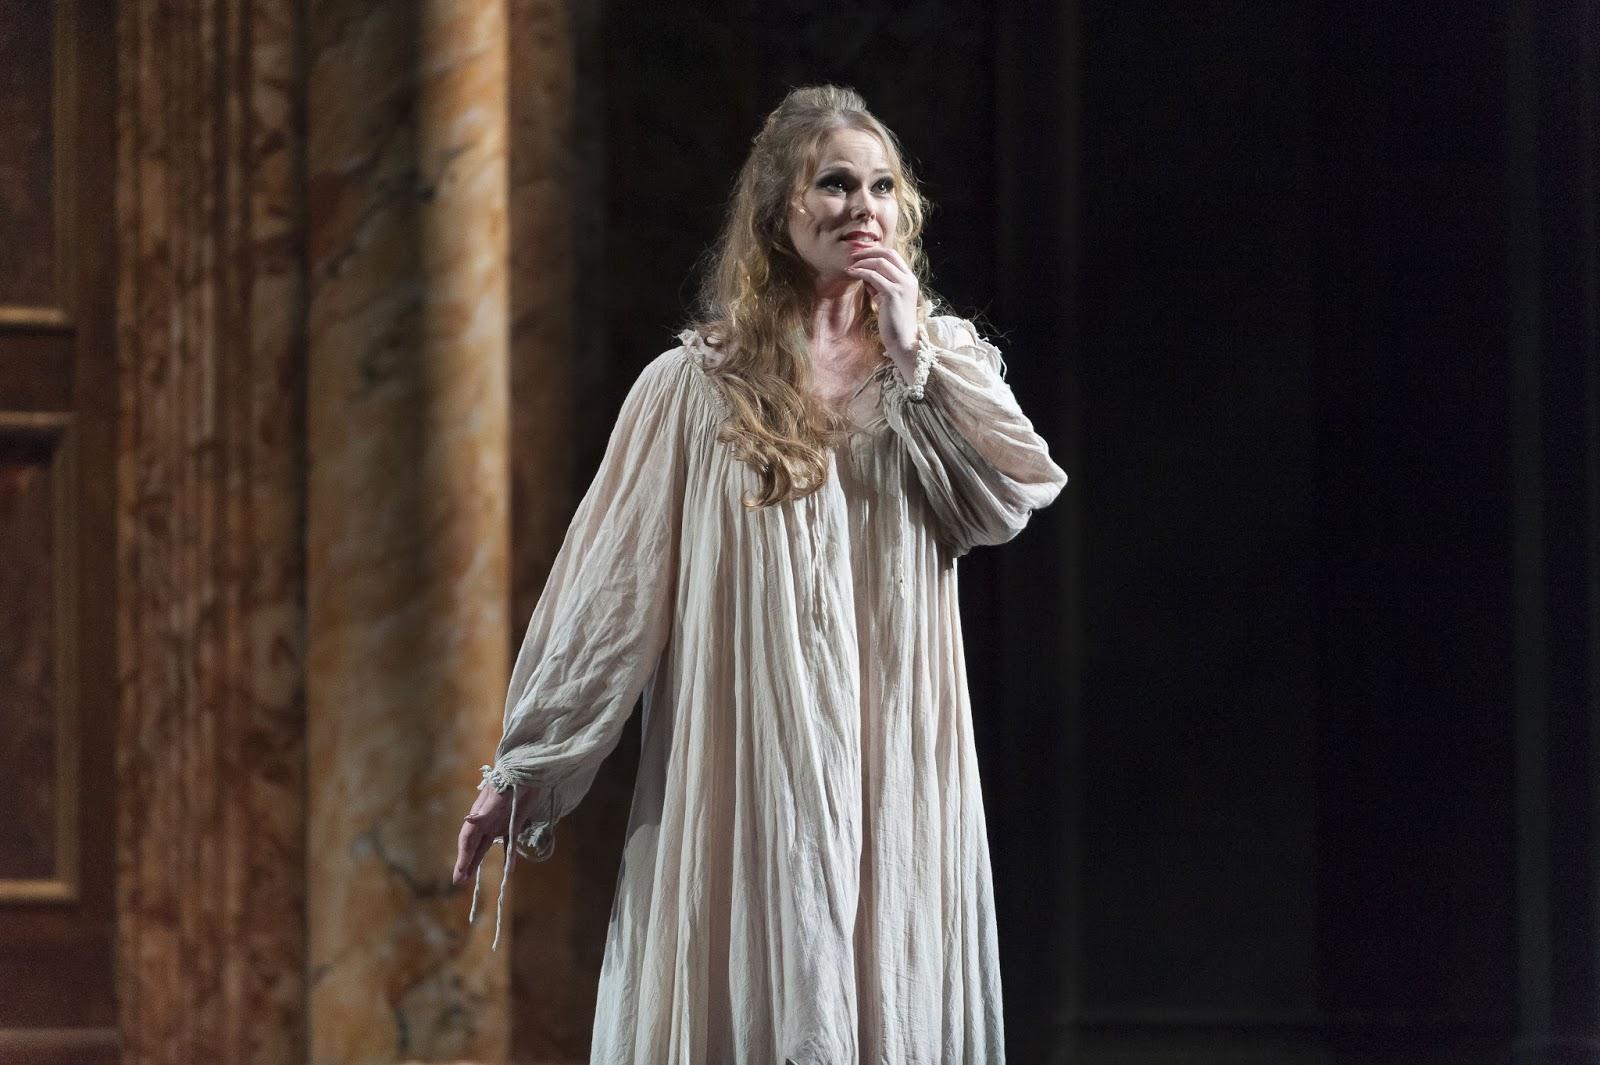 SINGER SPOTLIGHT: Soprano JESSICA PRATT as Gilda in Teatro de la Maestranza's 2013 production of Giuseppe Verdi's RIGOLETTO in Sevilla, Spain [Photo by Jesús Morón, © by Teatro de la Maestranza]